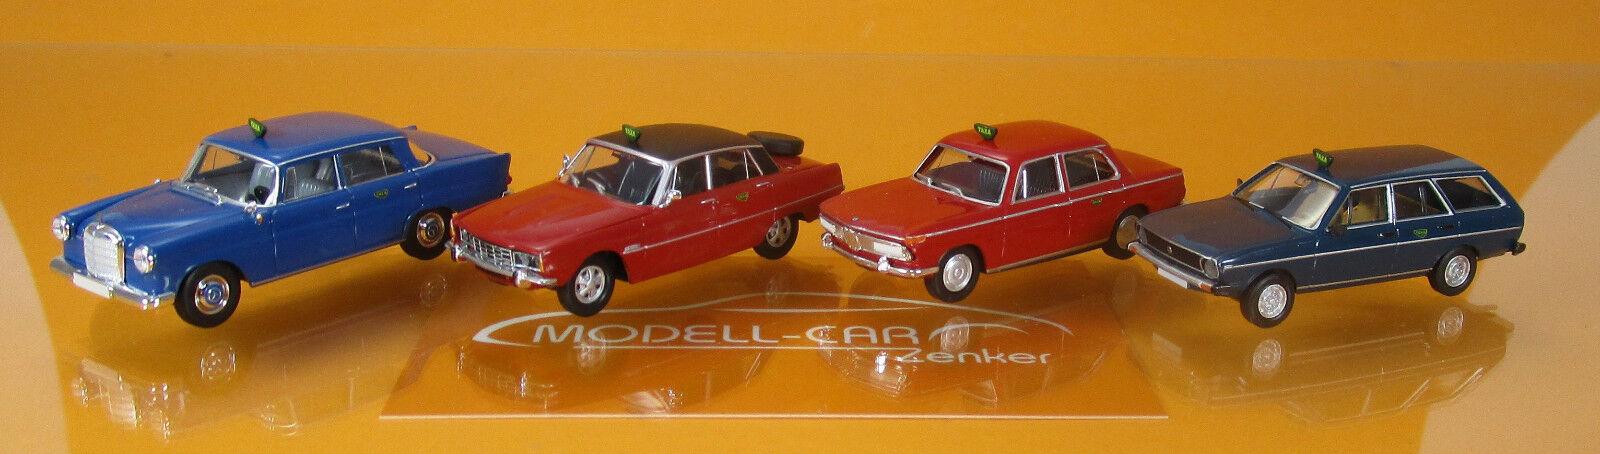 Brekina 90467 économies 2  qui  de dk (BMW, MB 190 C, Rover, VW Passat)